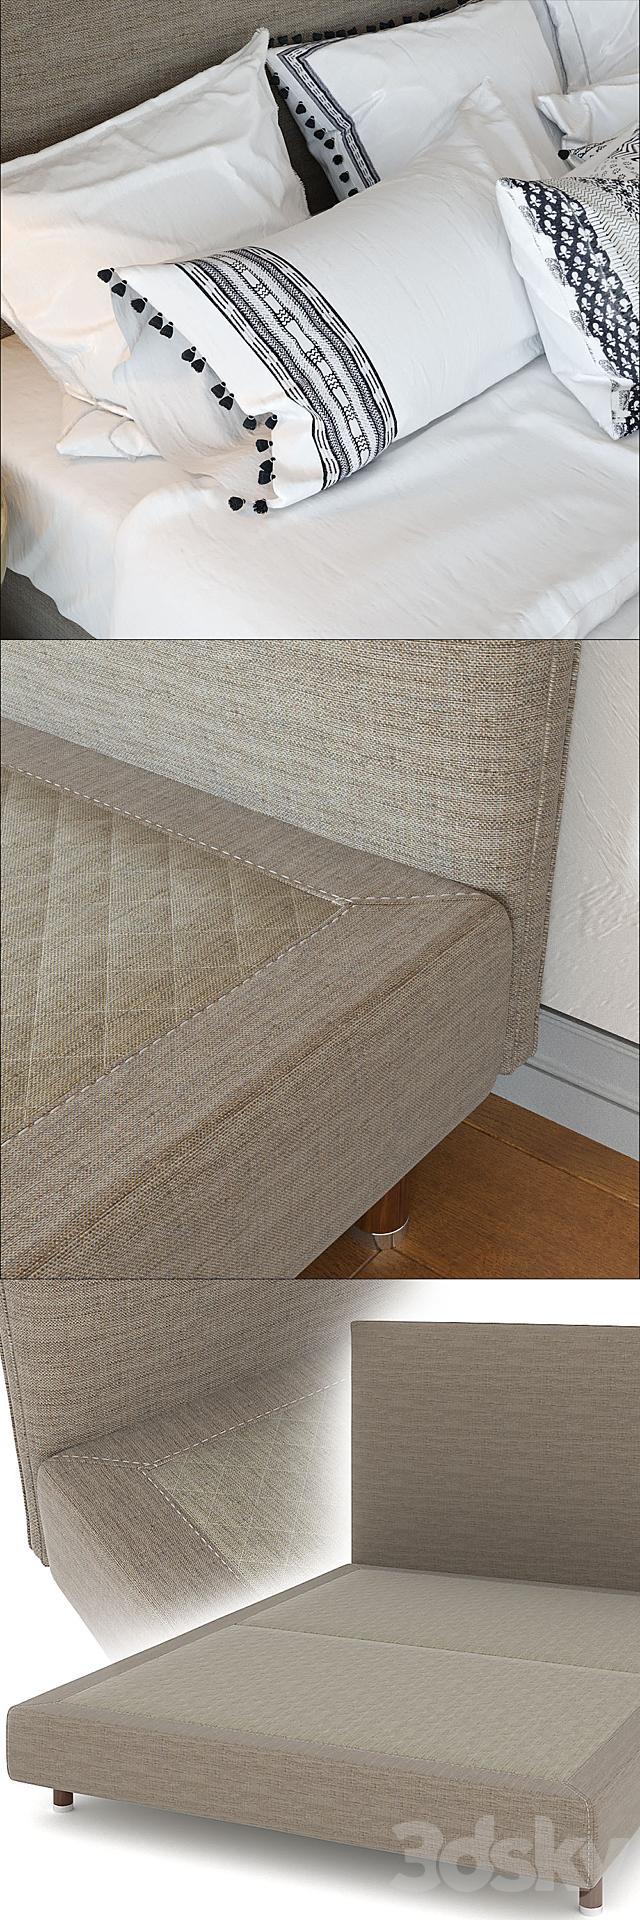 Zara Home Linen Collection Bedding + Greco Strom Bed # 7